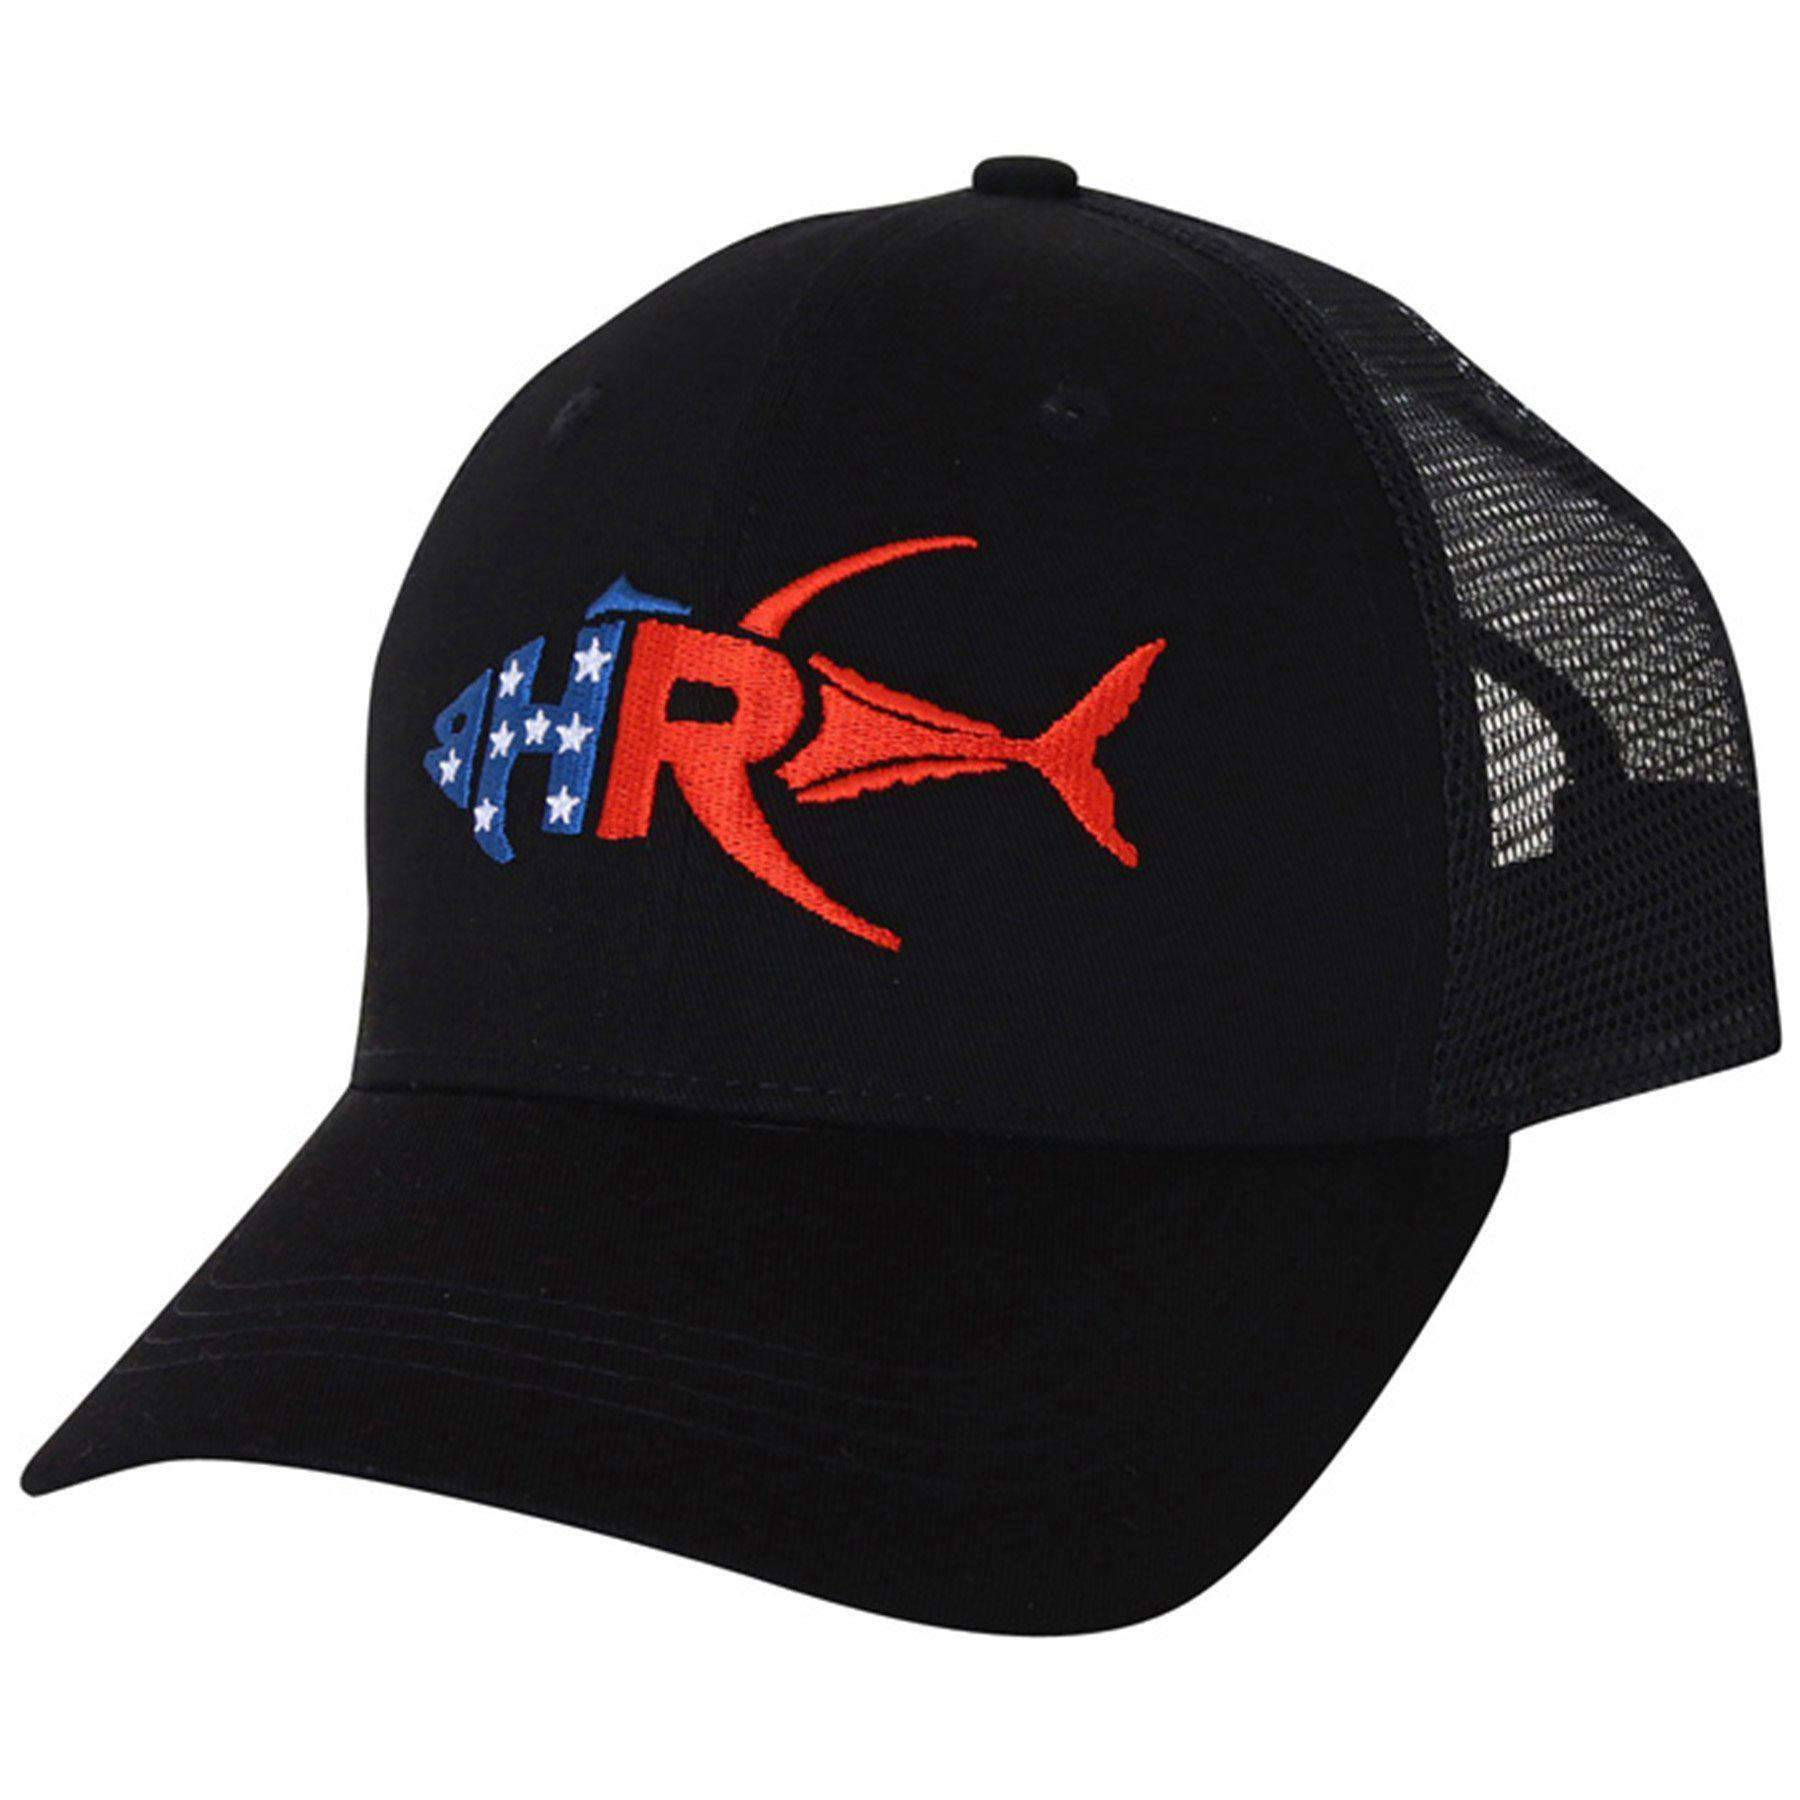 Home Run Original Trucker Hat